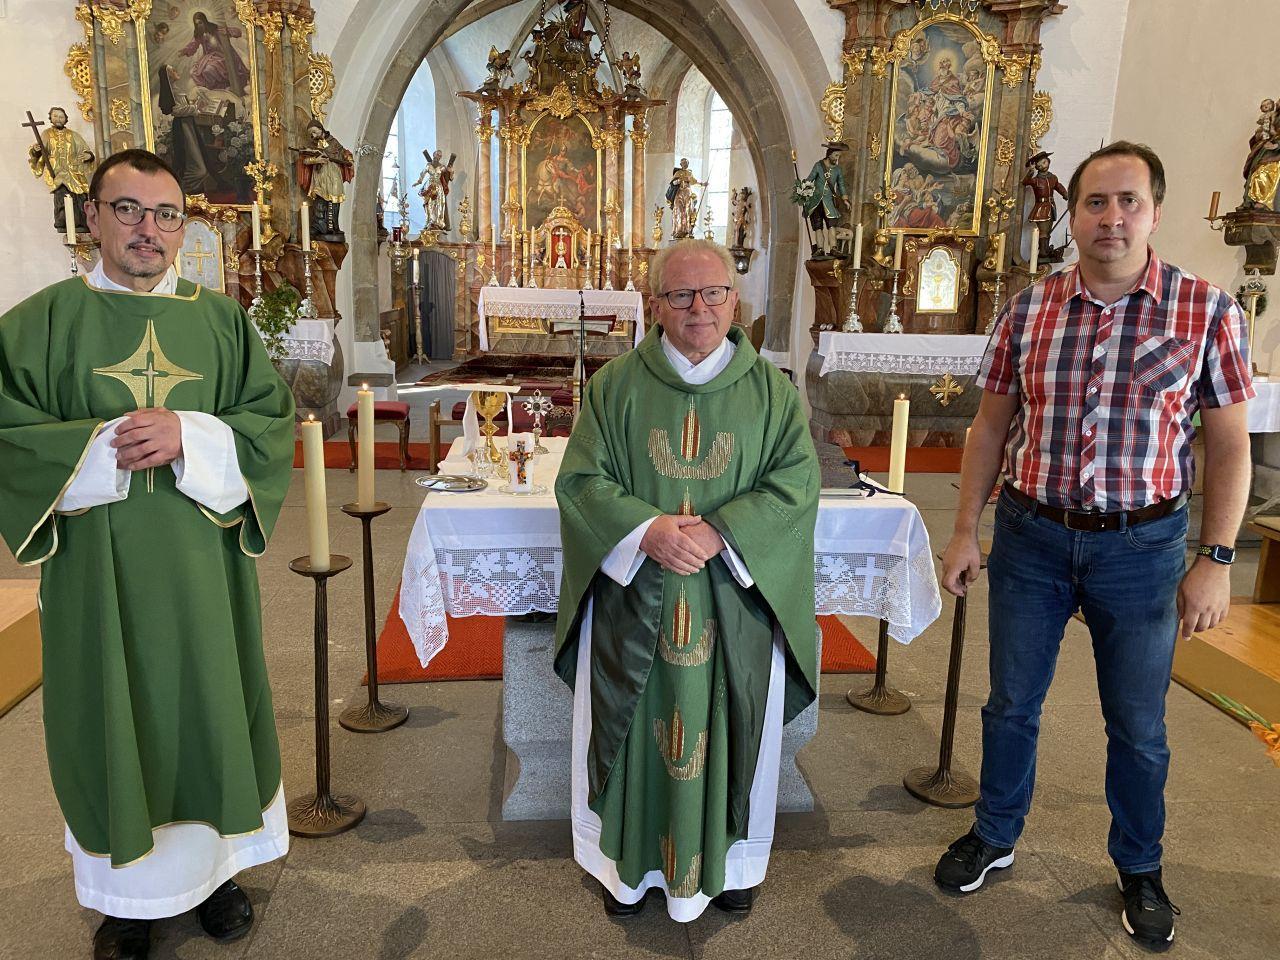 Begrüßung Peintinger Miltach